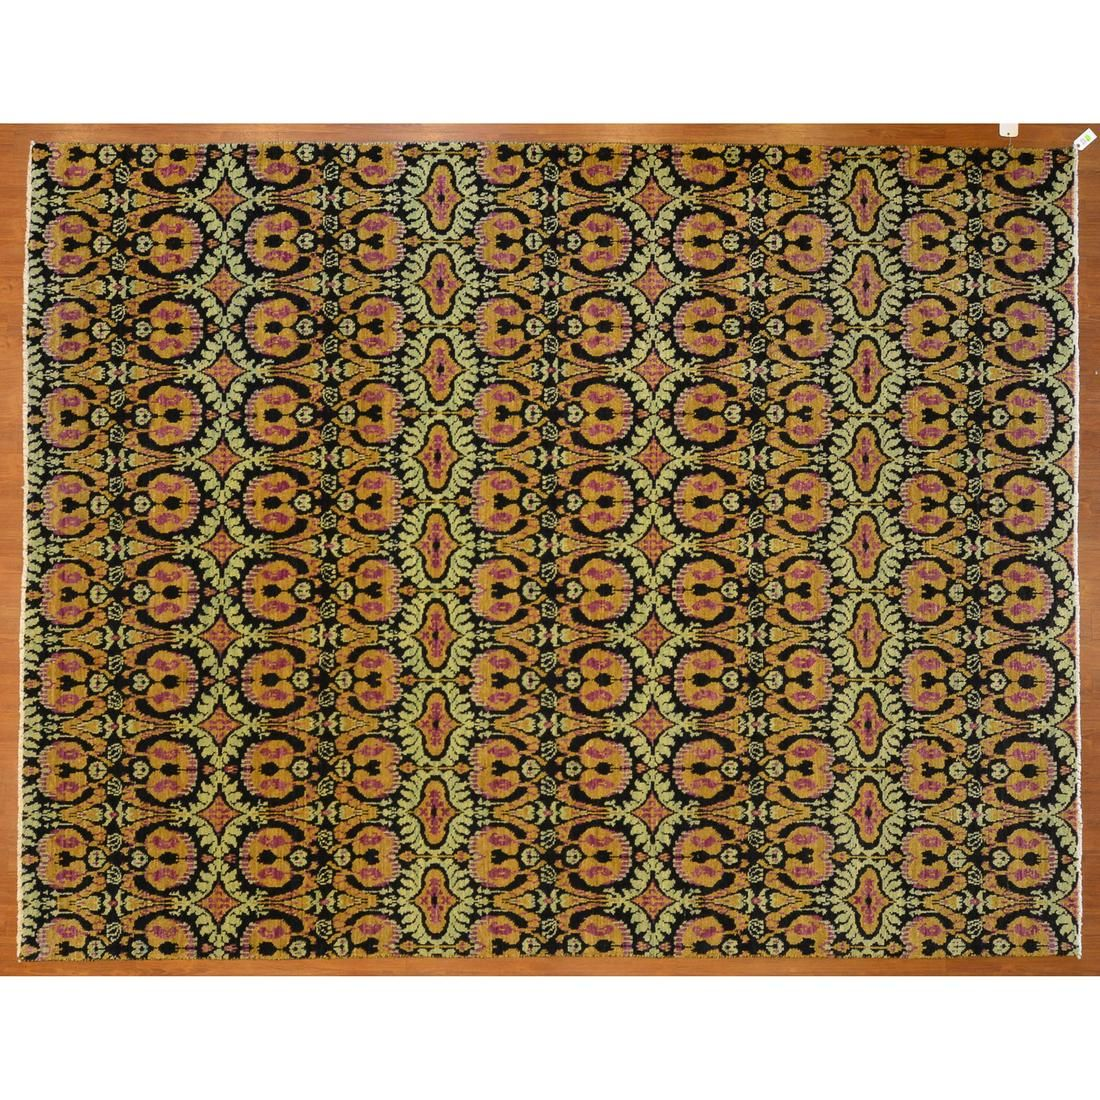 Samad Vogue Collection Carpet, India, 9.1 x 11.9